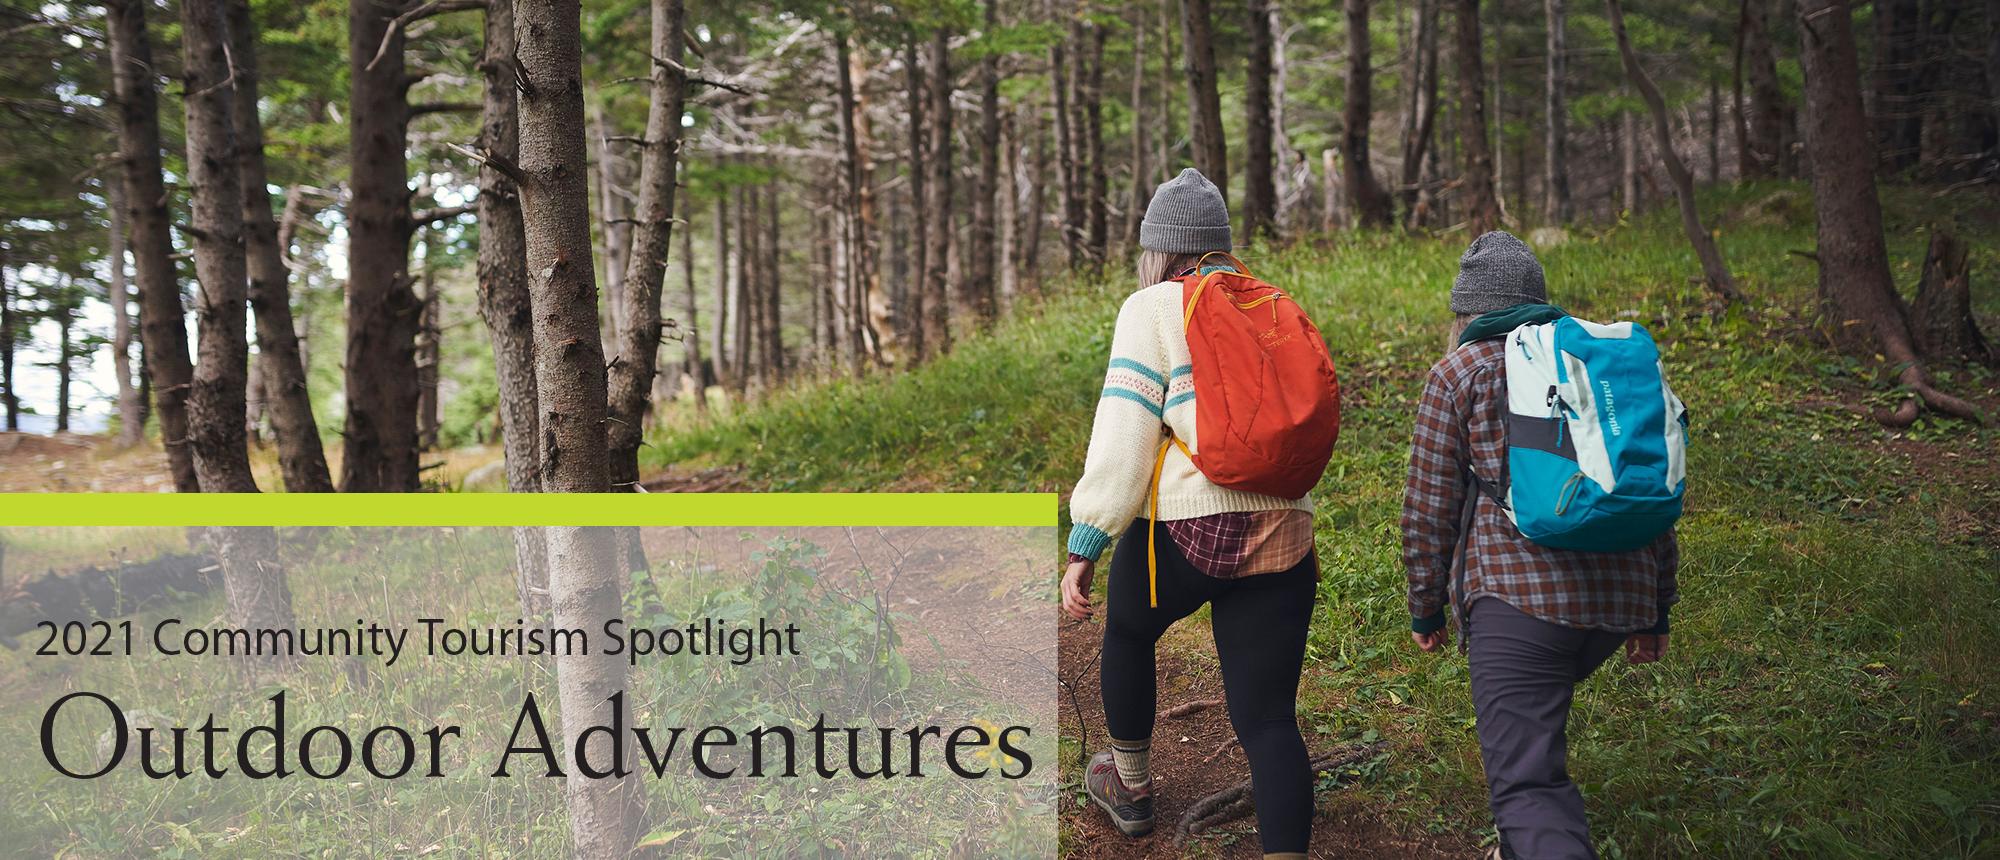 Community Tourism Spotlight – Outdoor Adventures